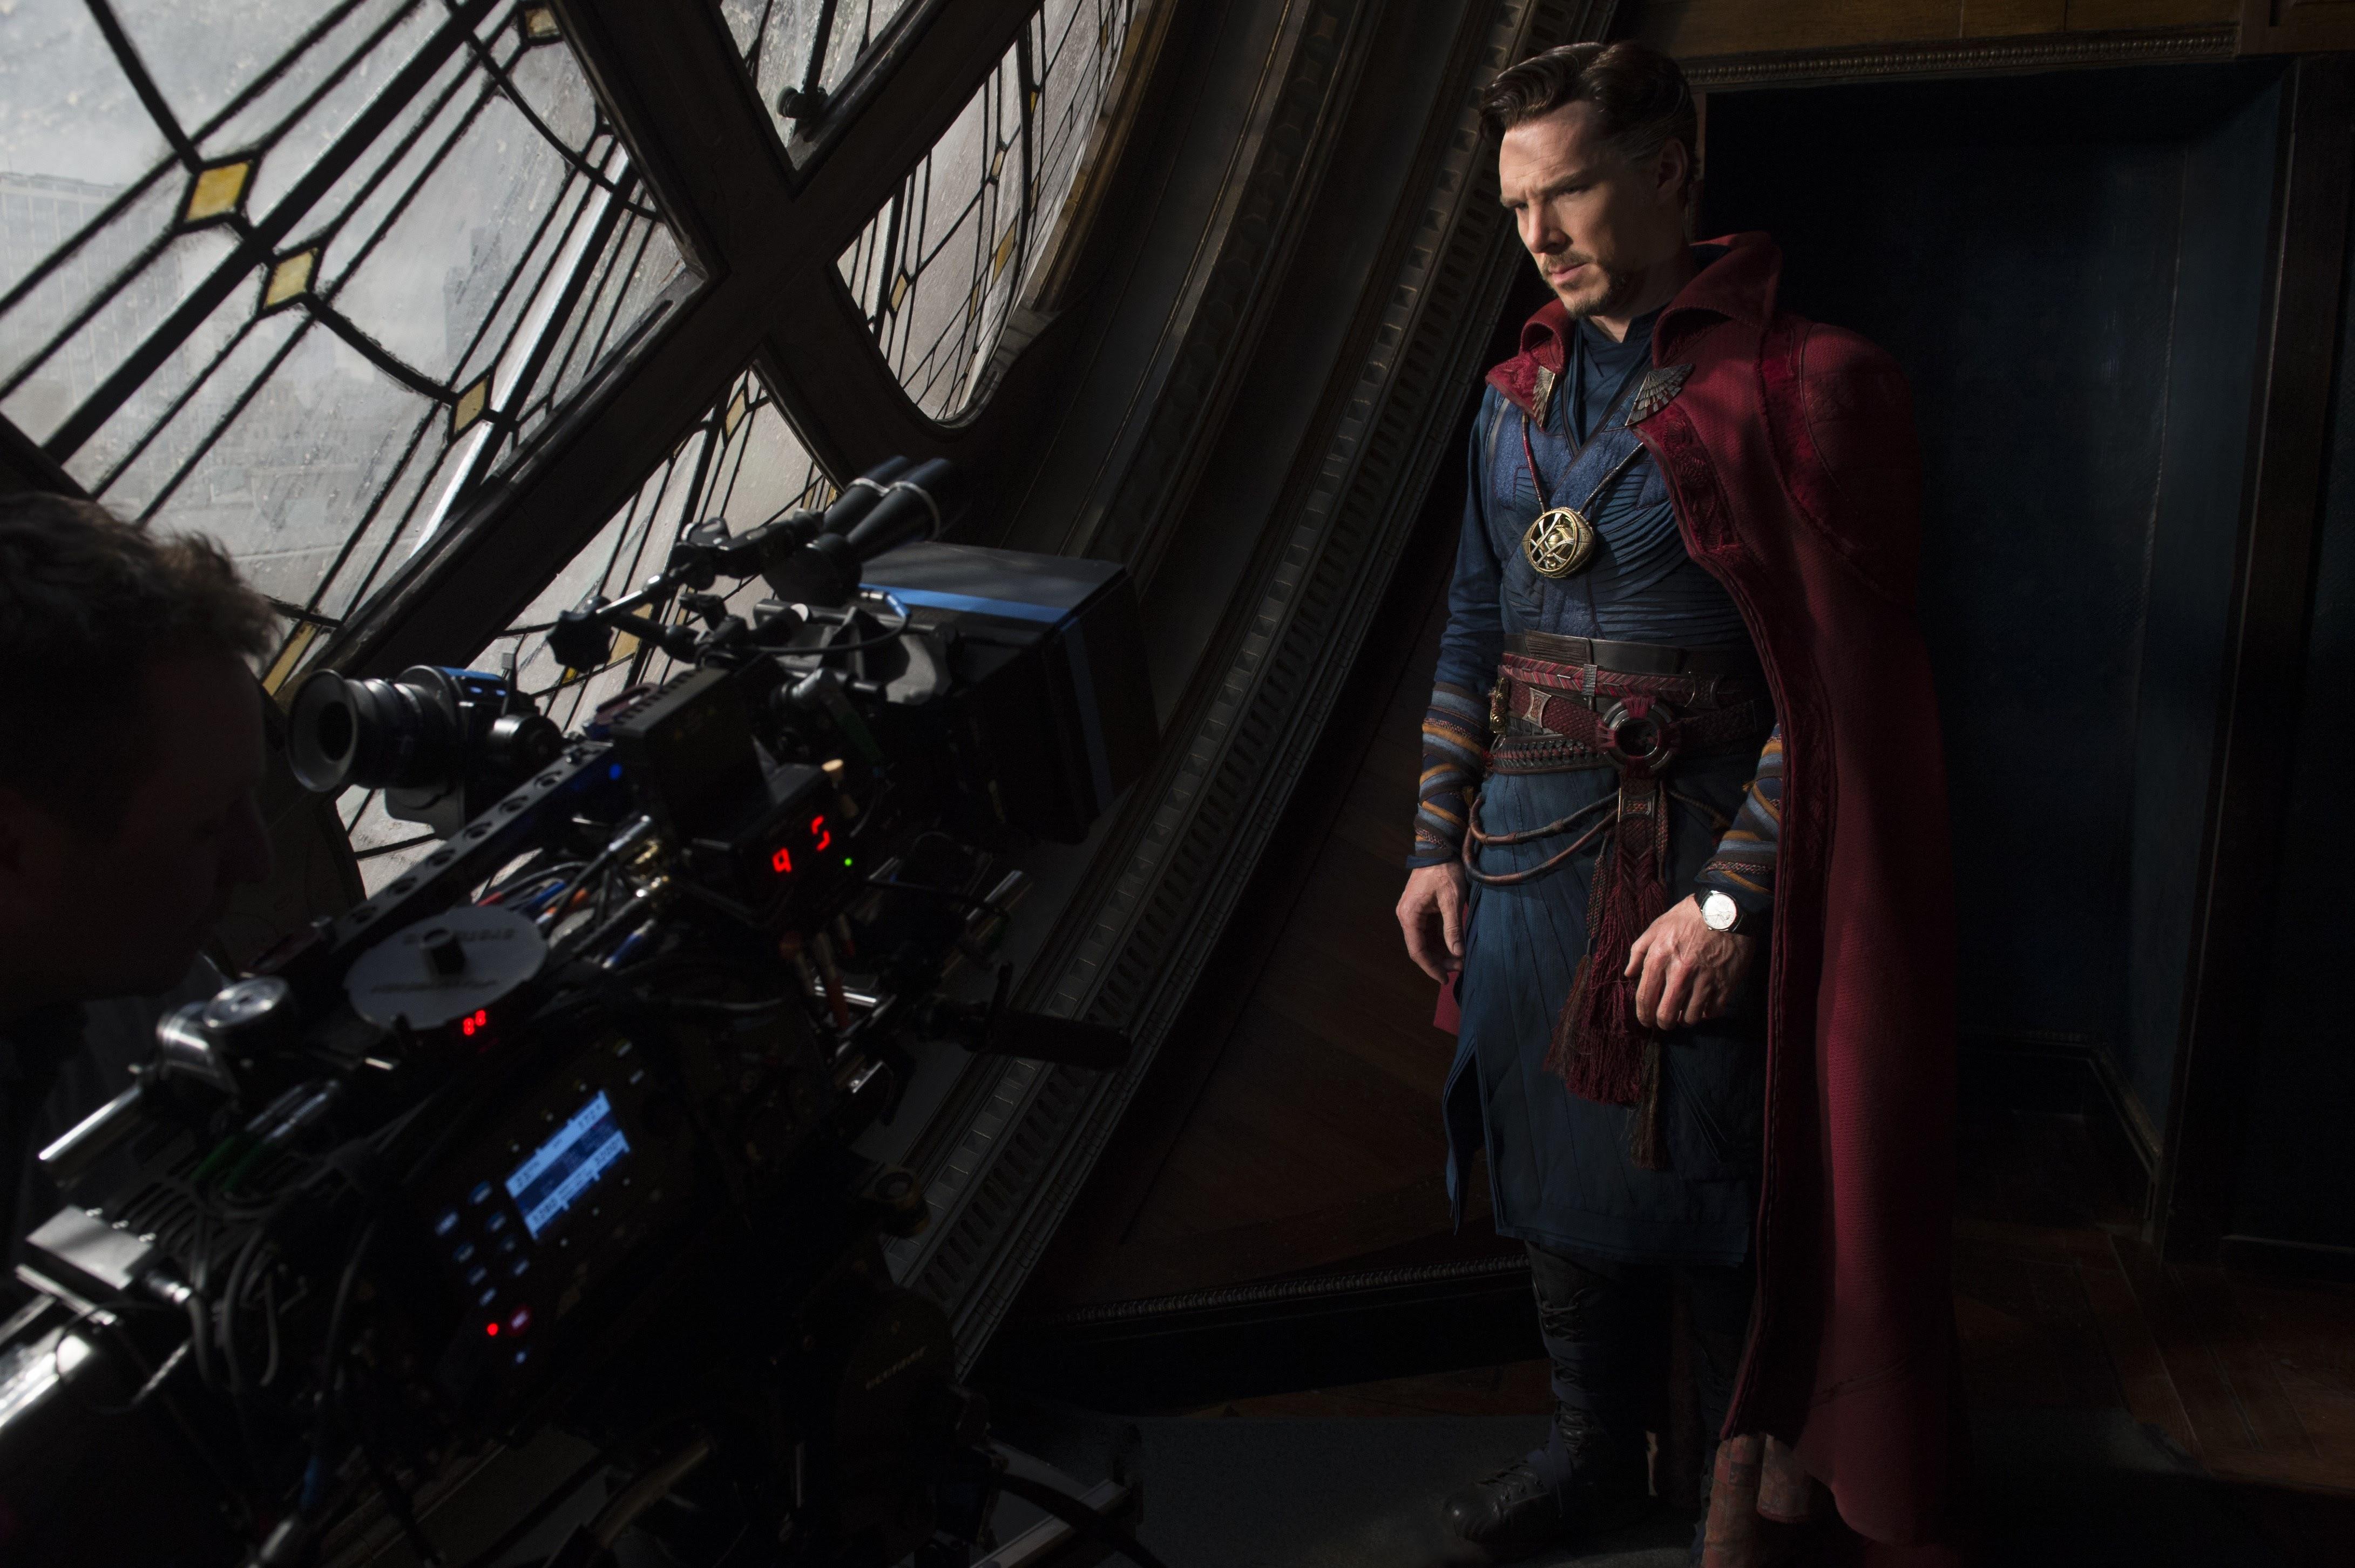 Doctor Strange 2 : ベネディクト・カンバーバッチの魔法使いのヒーローが、スカーレット・ウィッチと共演する「ドクター・ストレンジ」の第2弾「マルティヴァース・オブ・マッドネス」は初夏の5月にクランクイン ! !